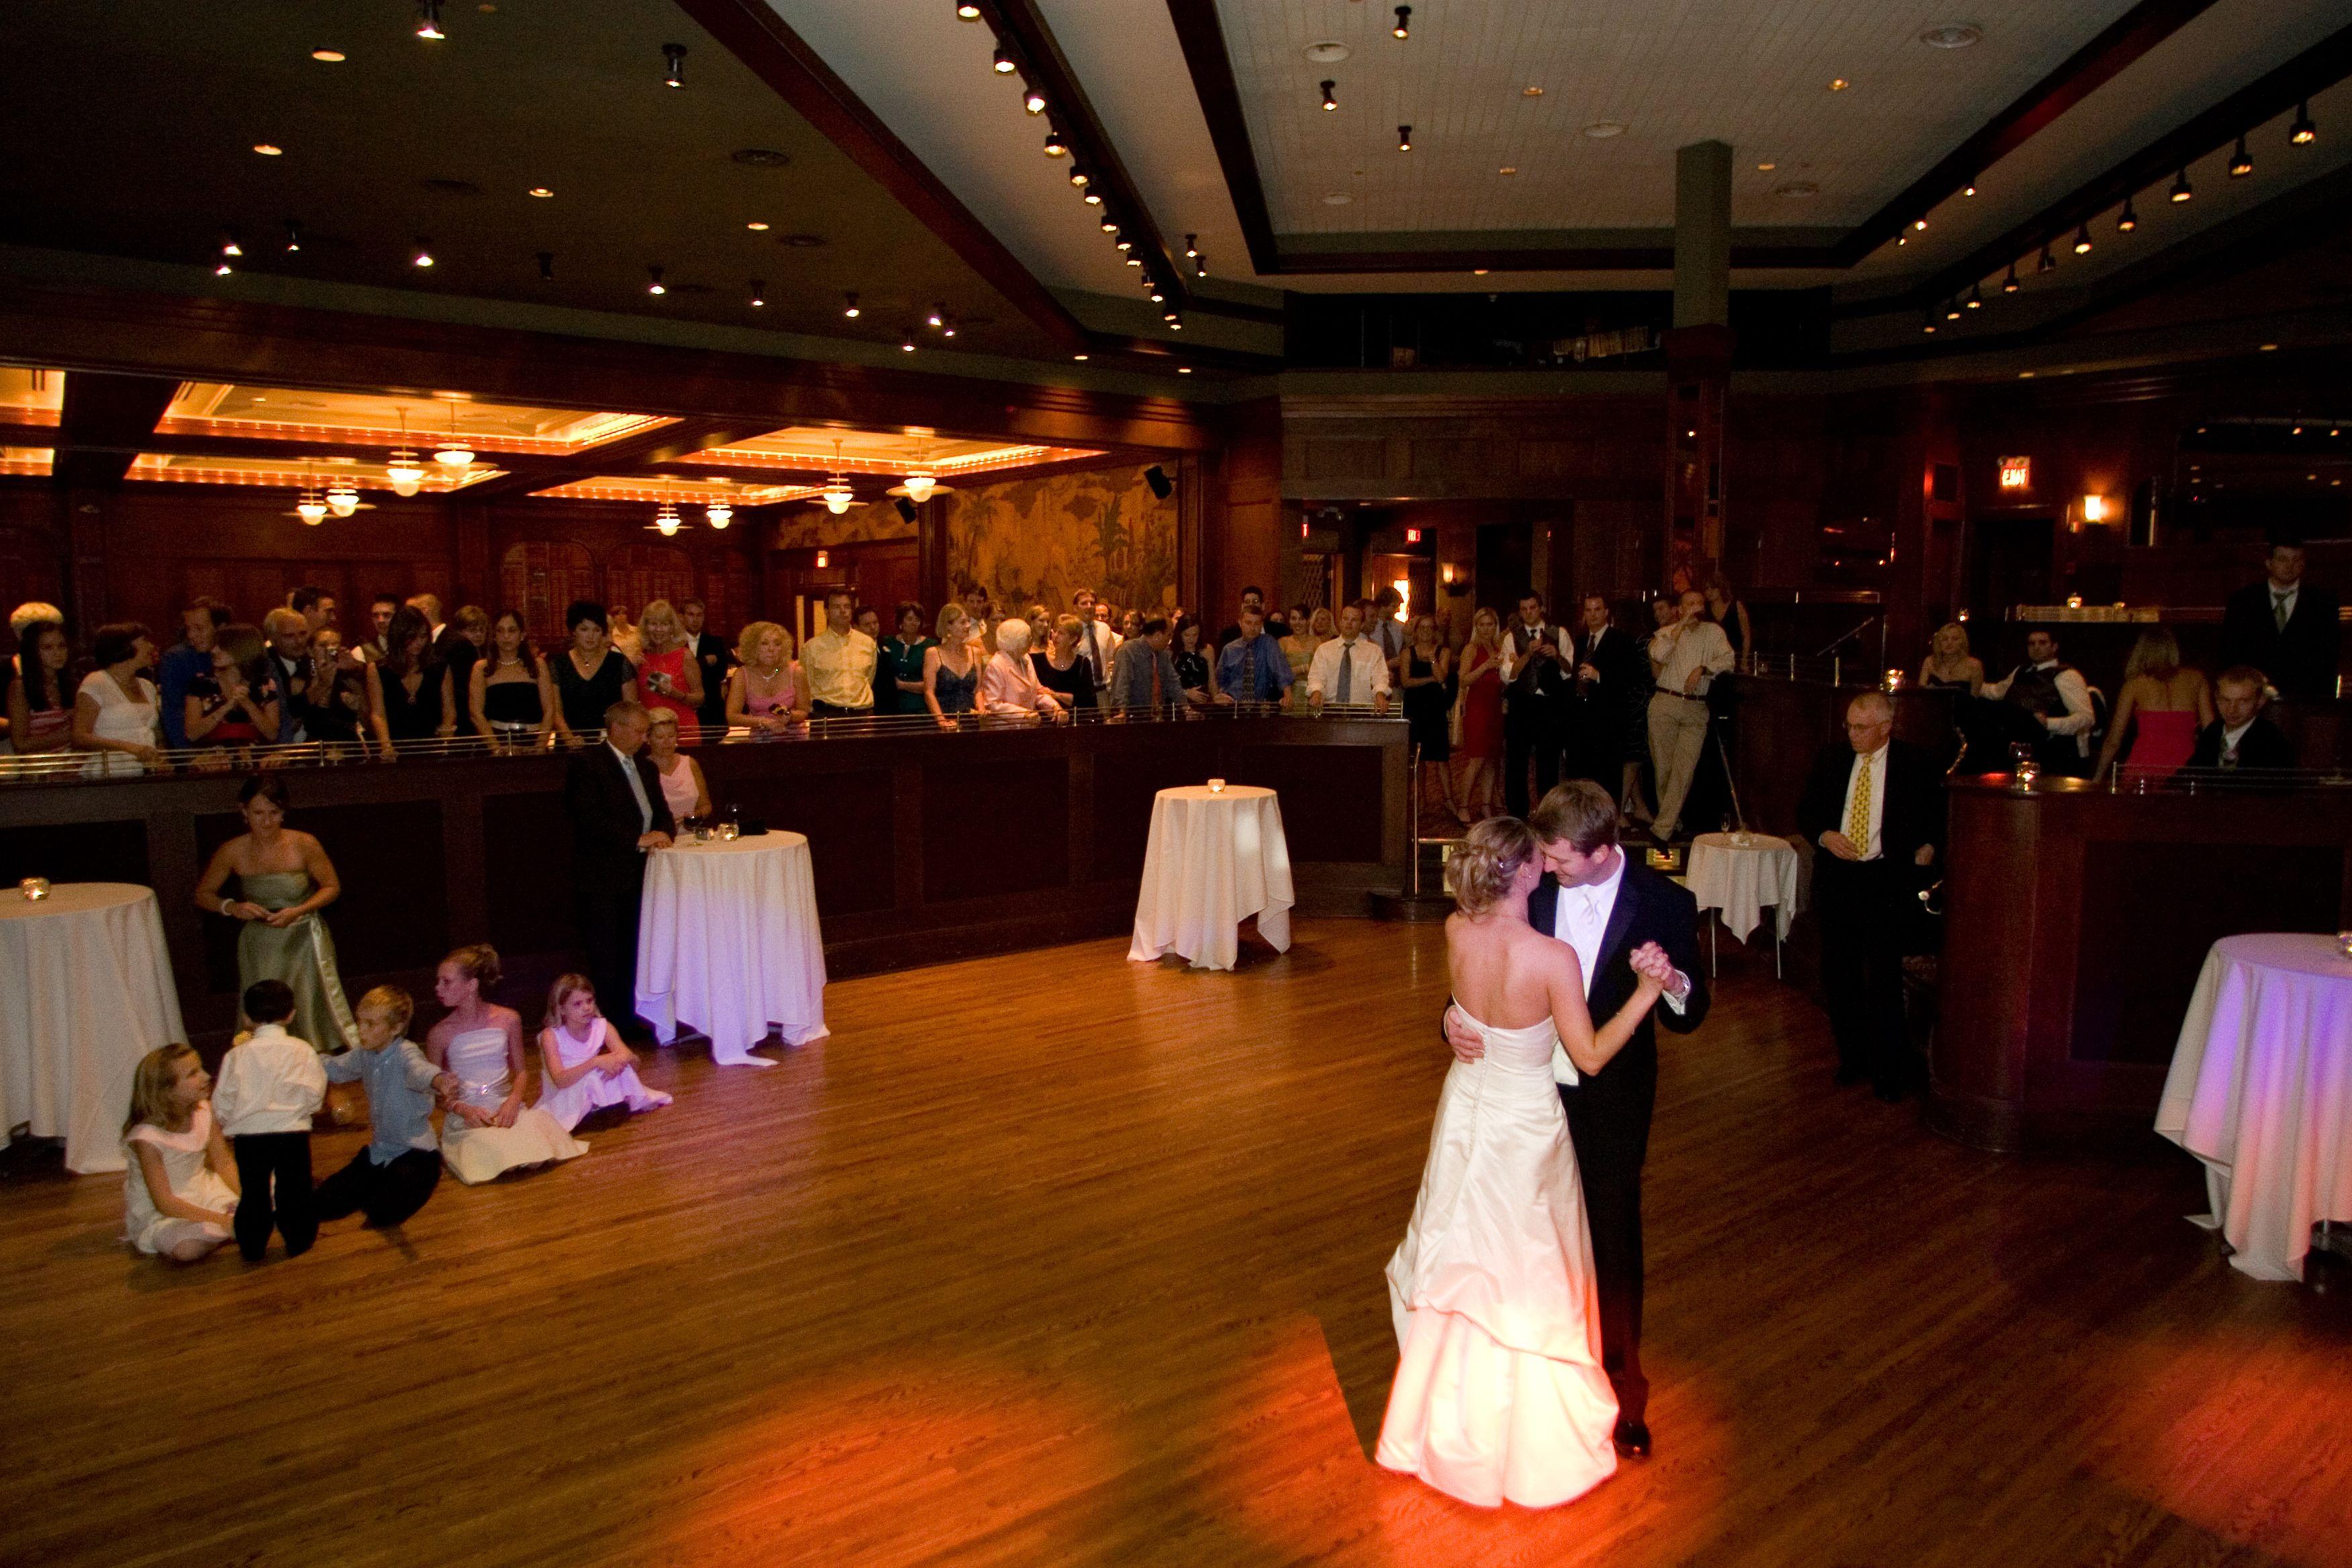 wedding halls st paul mn%0A  Minnesota  weddings http   christos bellagala com  fetch u   dyes       Bridal  Companies  u     Wedding Professionals   Jevel Wedding Planning       Pinterest    u